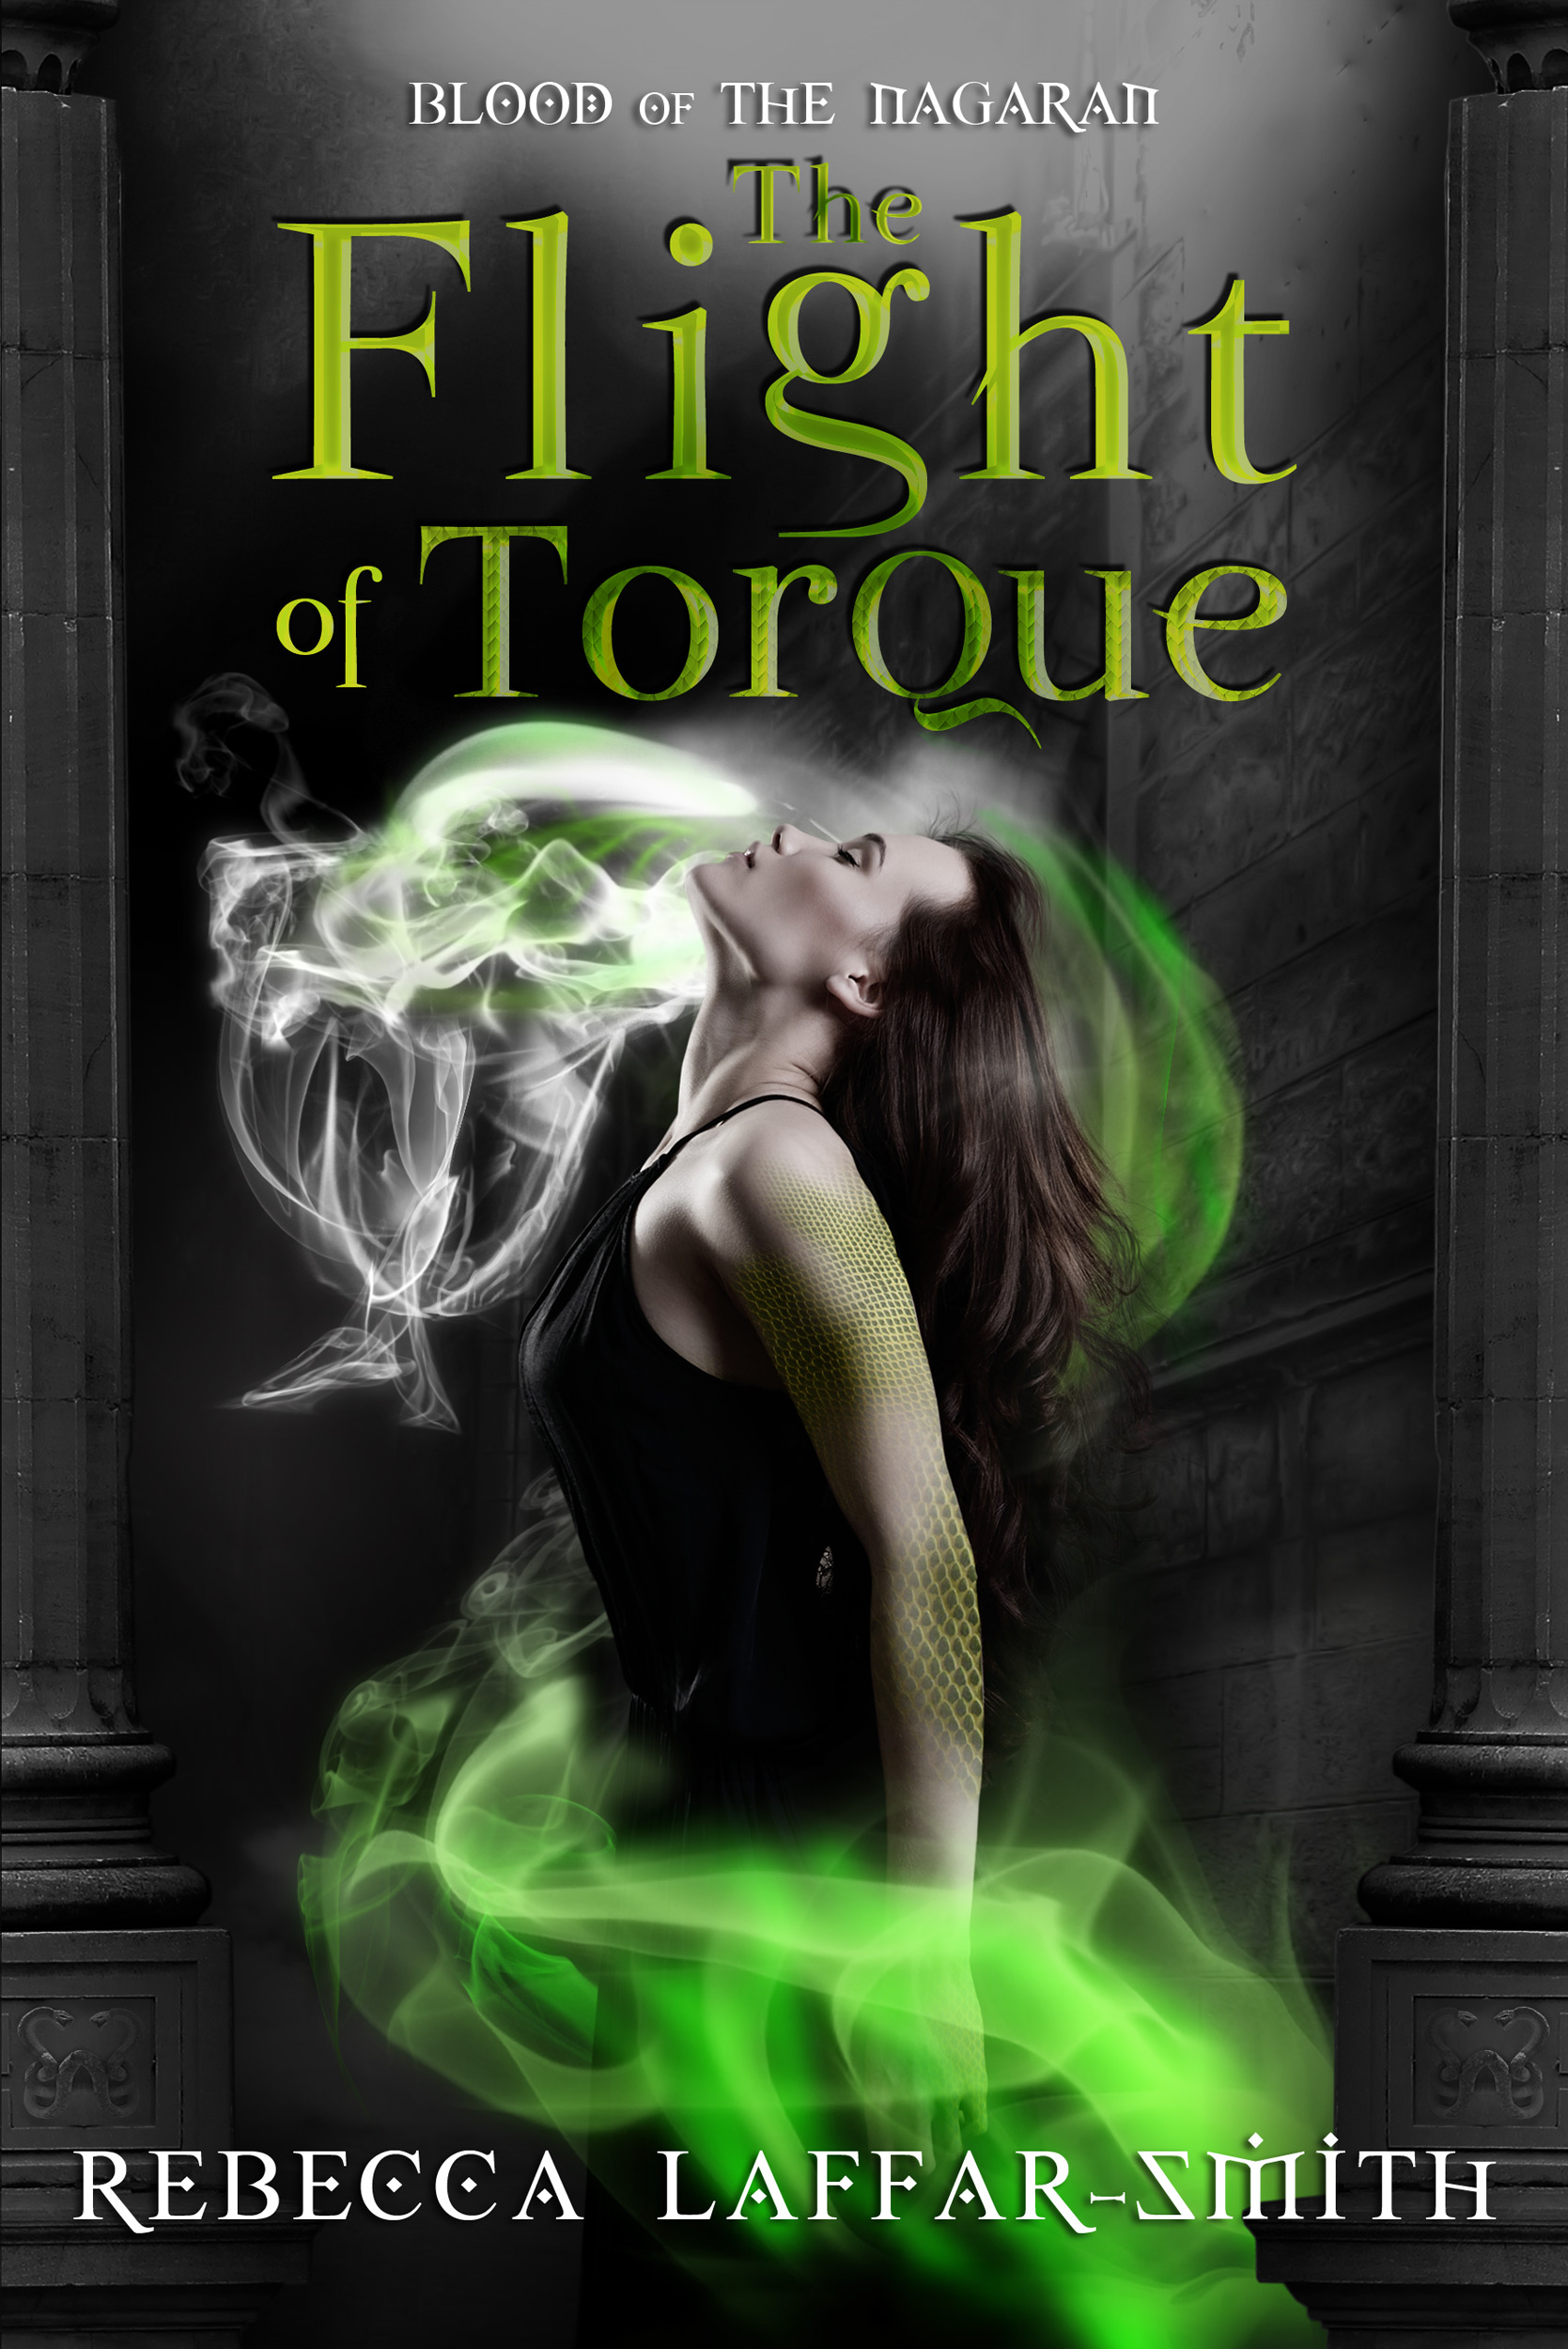 The Flight of Torque by Rebecca Laffar-Smith